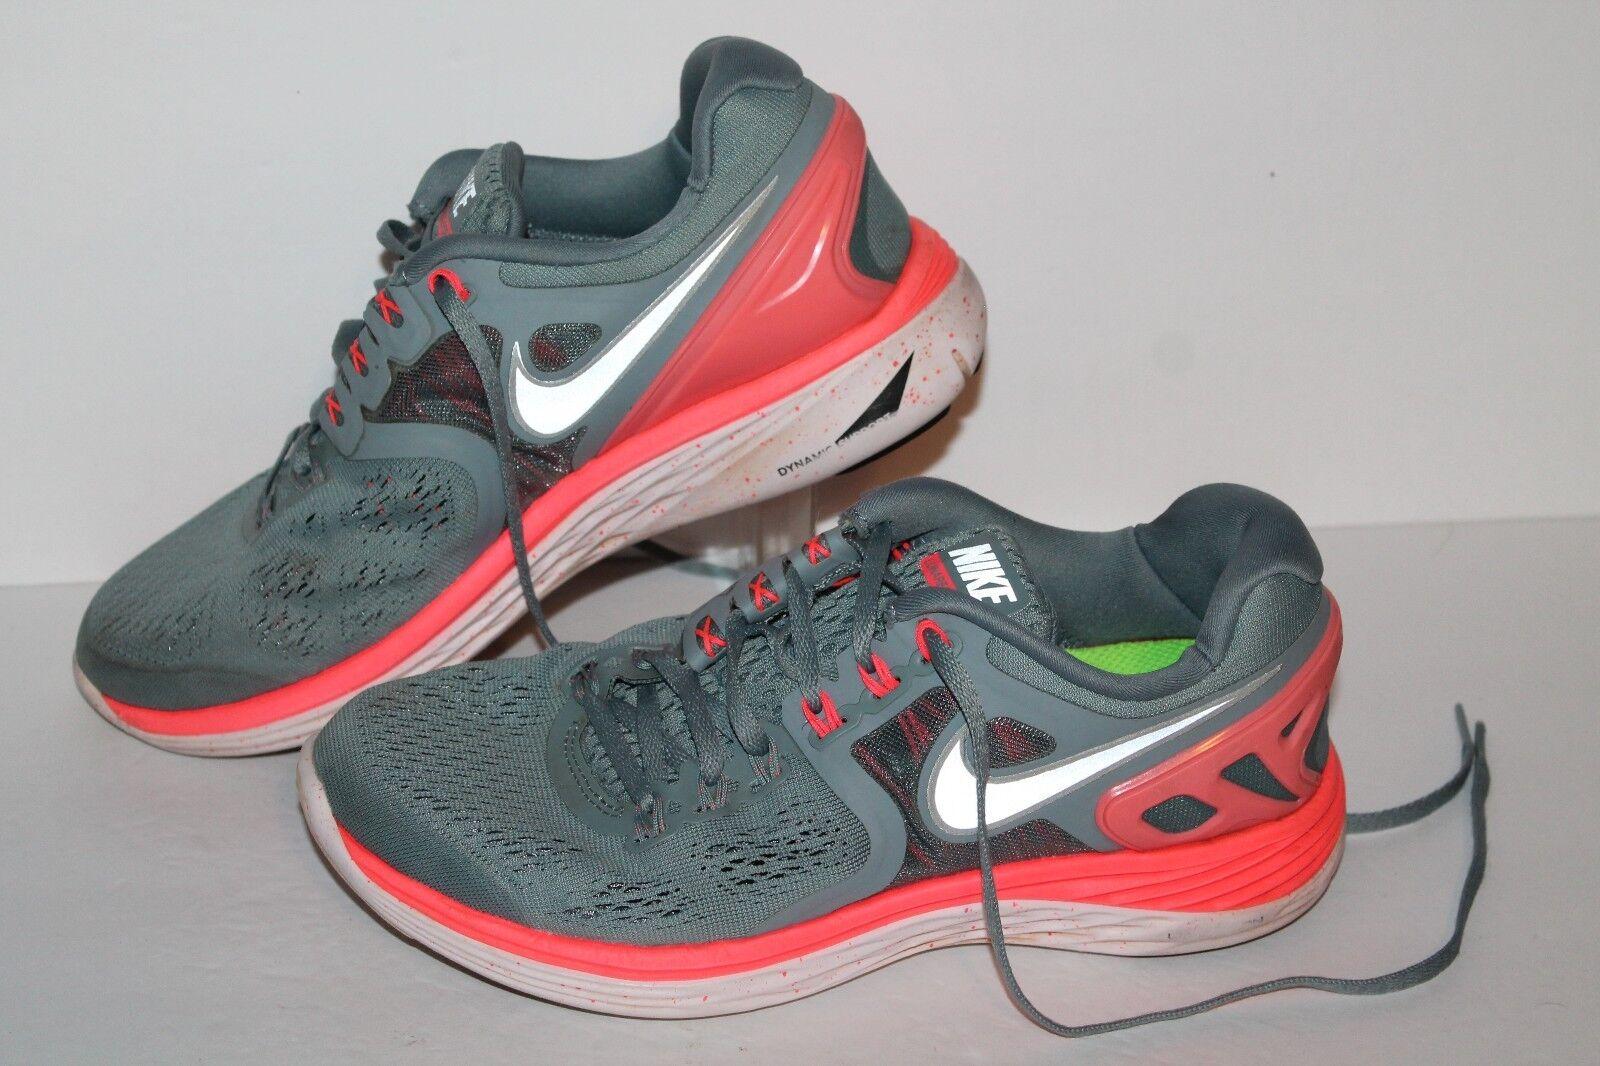 Nike Lunareclipse 4 Running Shoes, Grey/Pink, Womens US Comfortable Seasonal price cuts, discount benefits